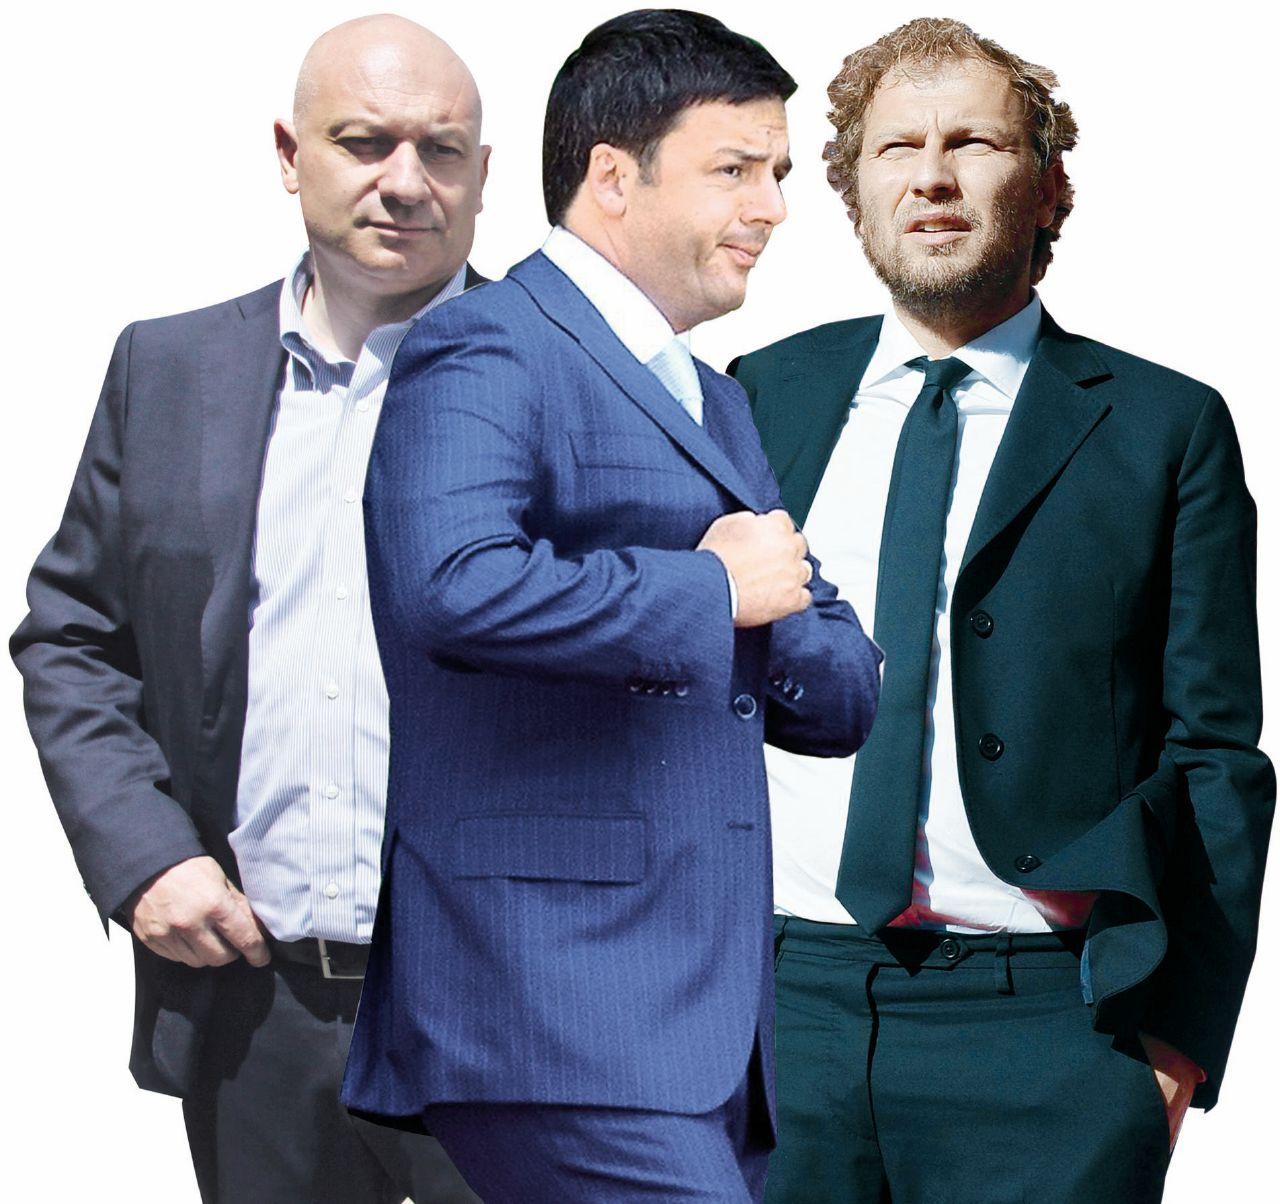 Vannoni-Lotti fratelli coltelli: ora Renzi ha davvero paura